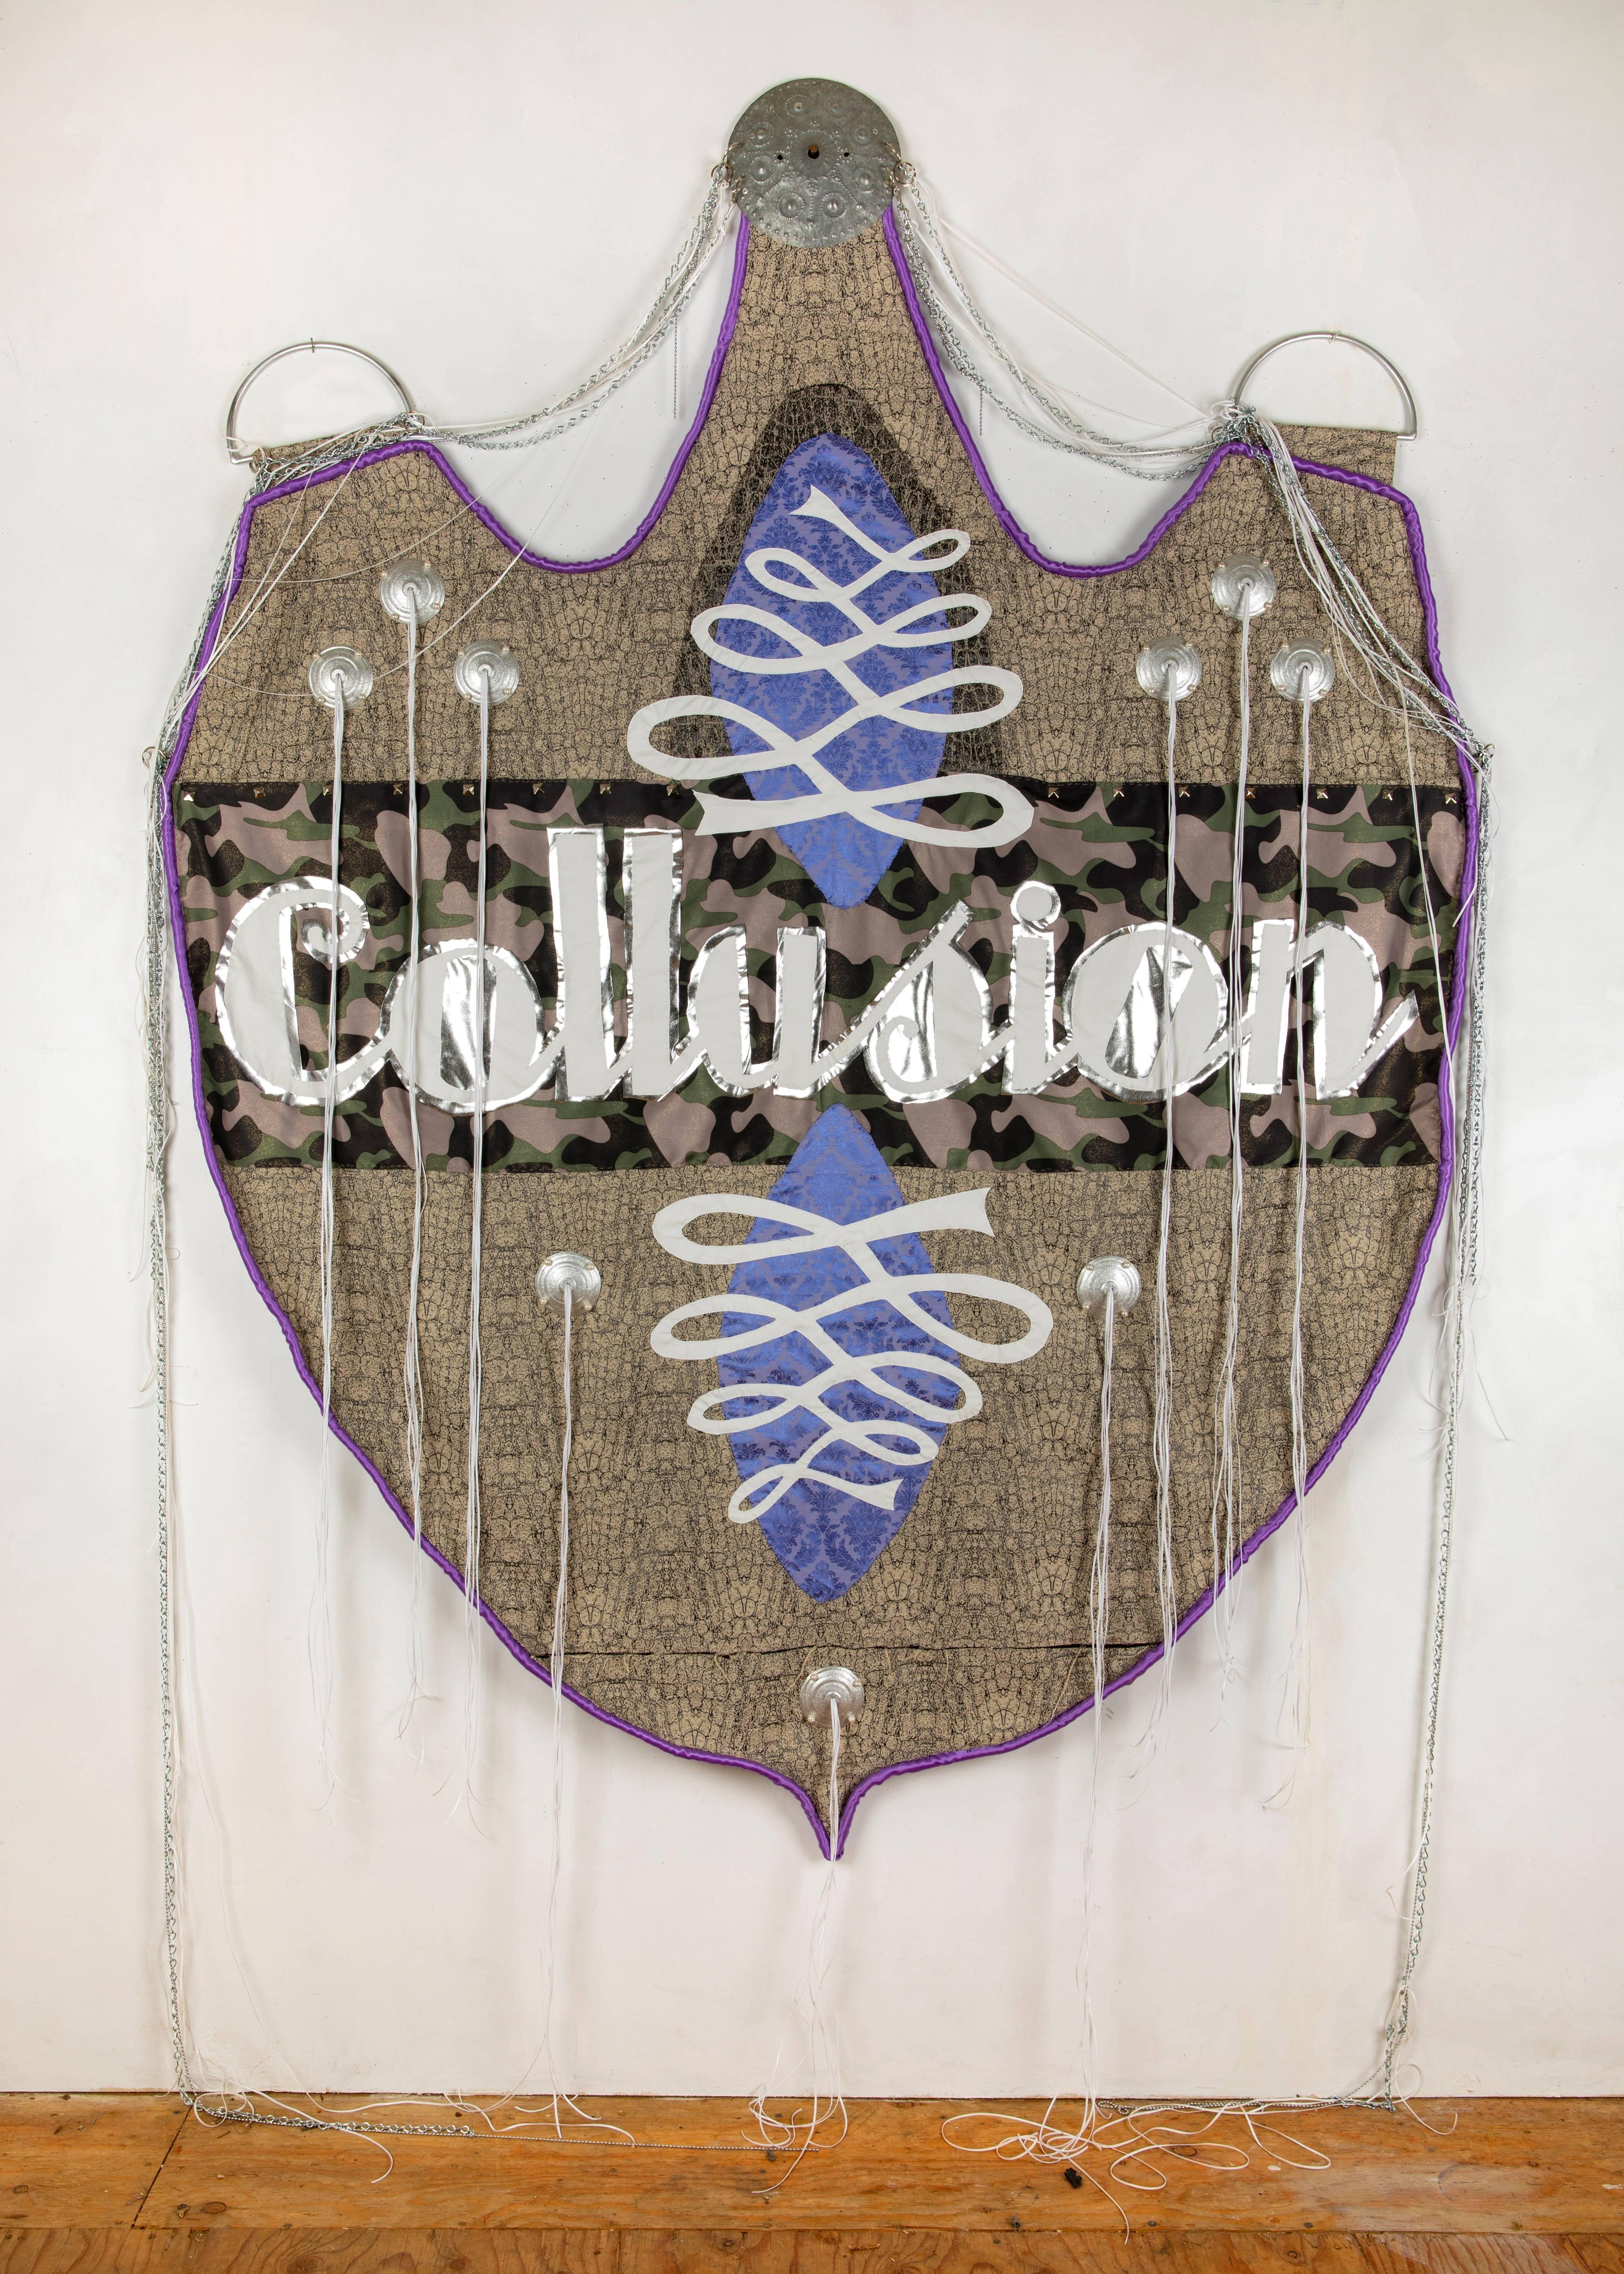 Rita Valley, Collusion, 2018, fabric, plastic, chain, steel, paint, gimp, banner